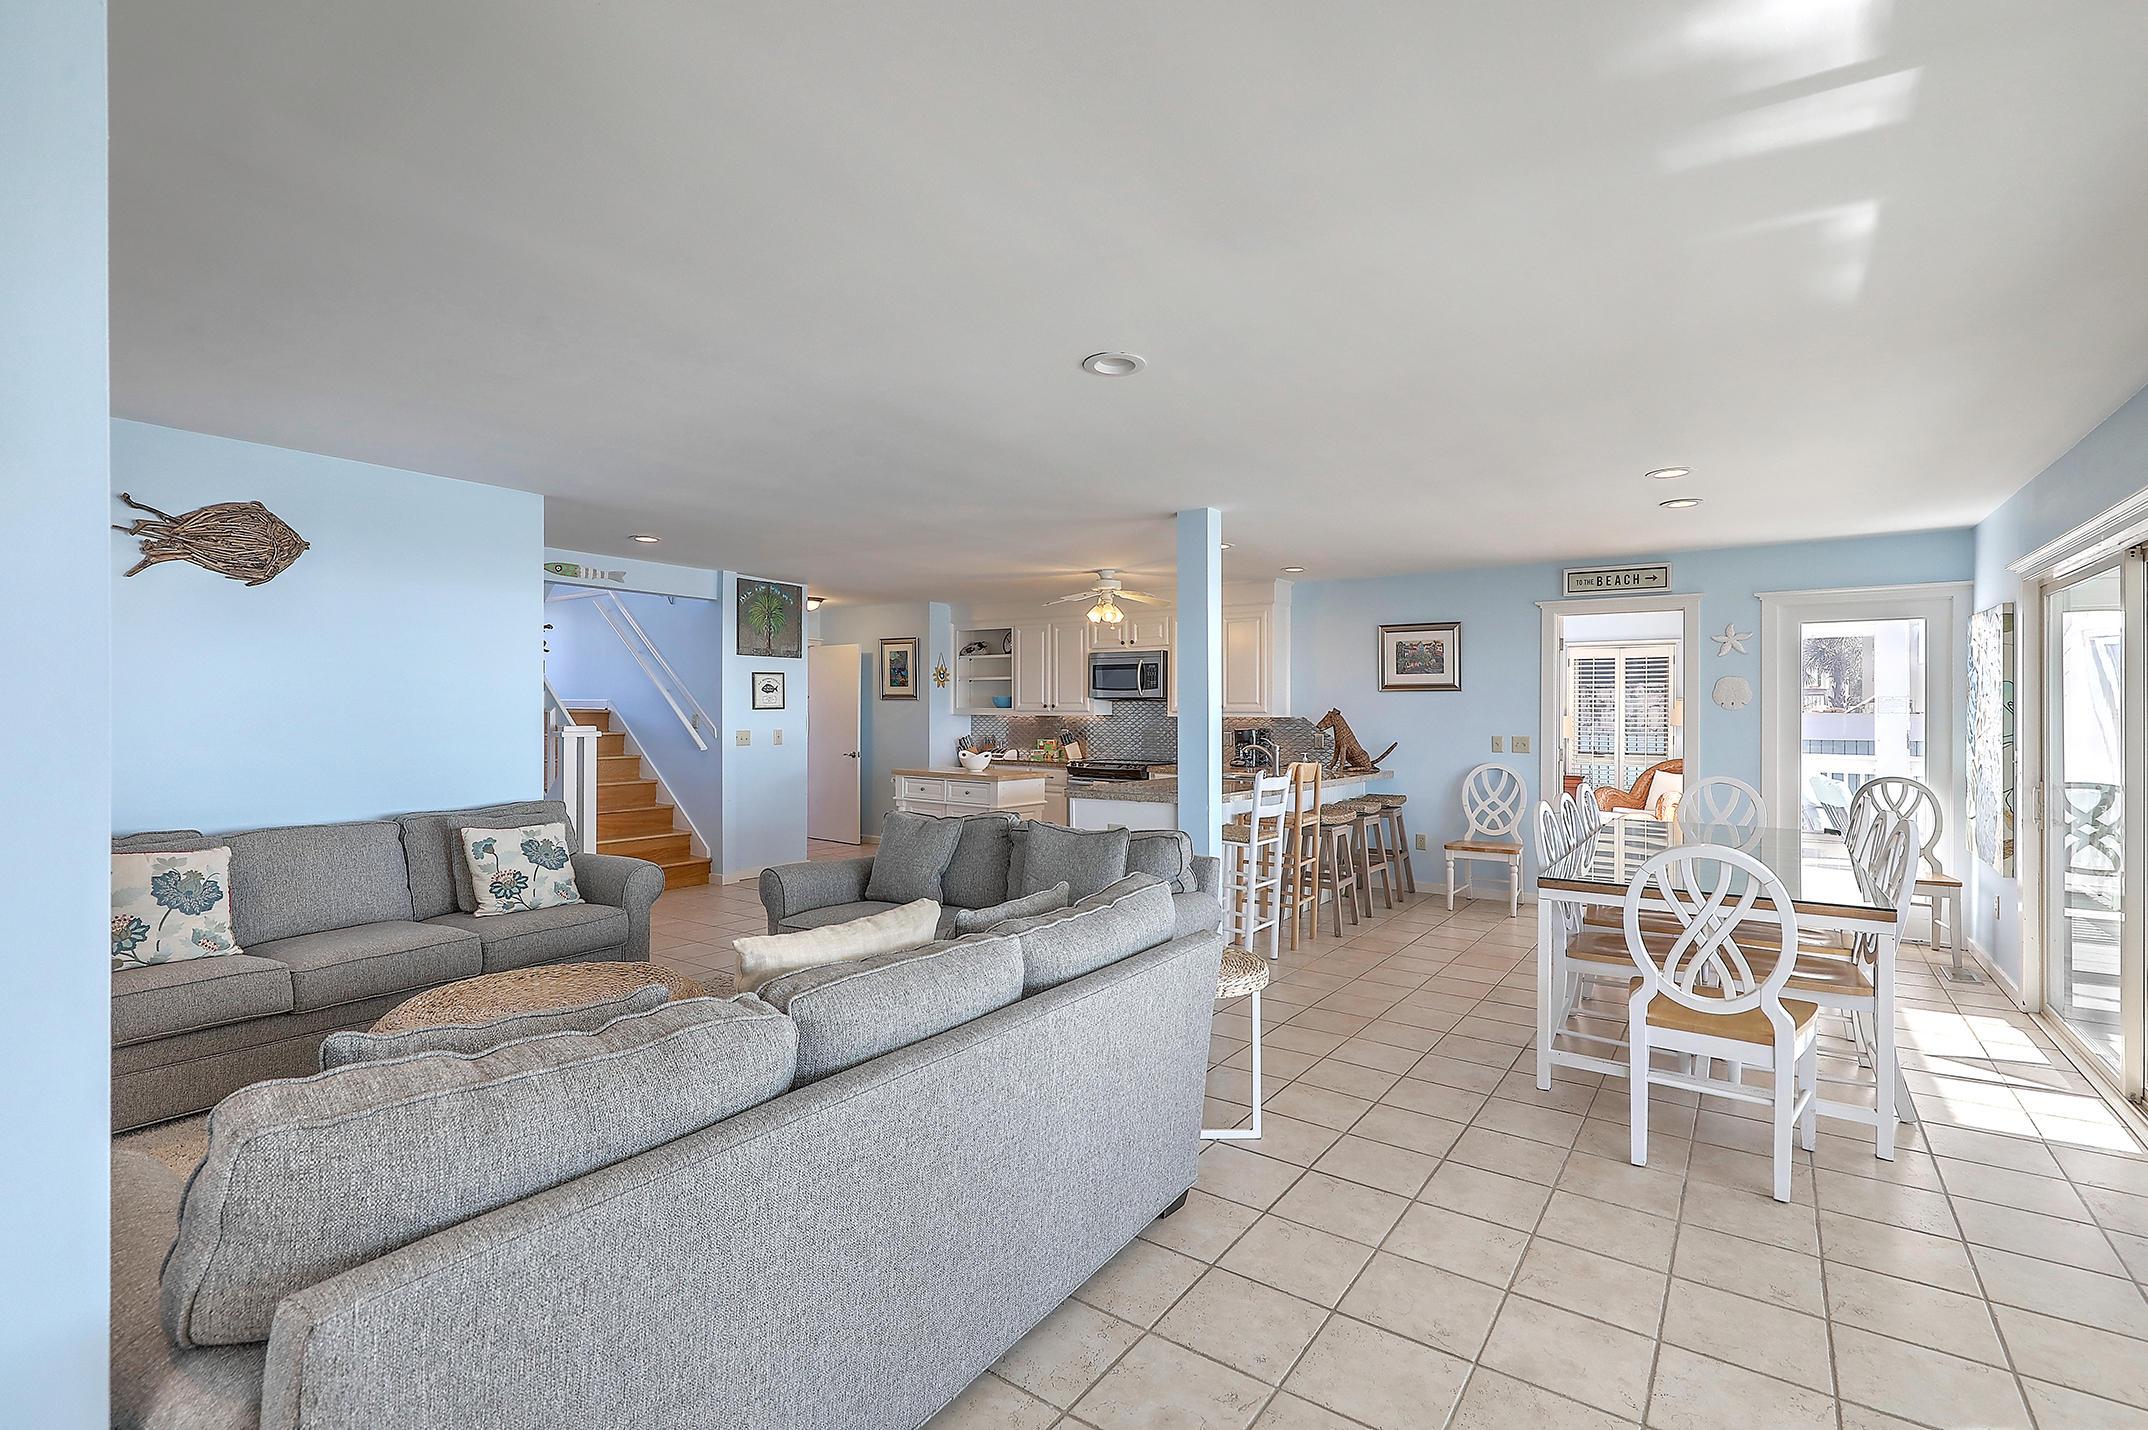 Wild Dunes Homes For Sale - 14 Beachwood East, Isle of Palms, SC - 18